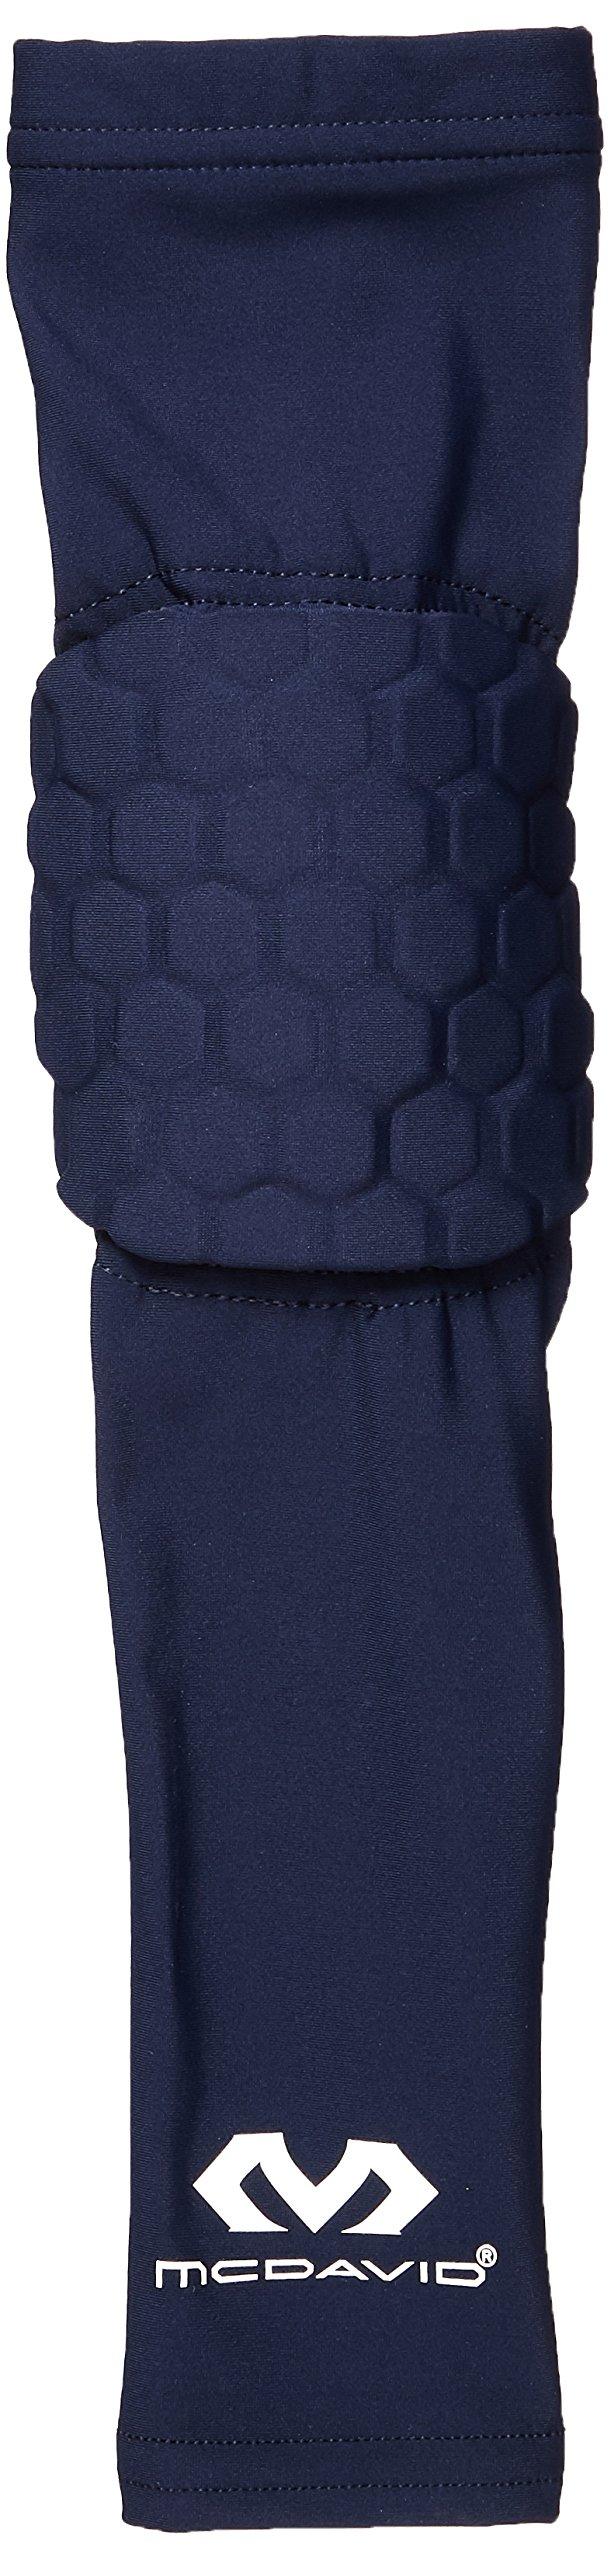 McDavid Single Hex Shooter Arm Sleeve, X-Small, Royal